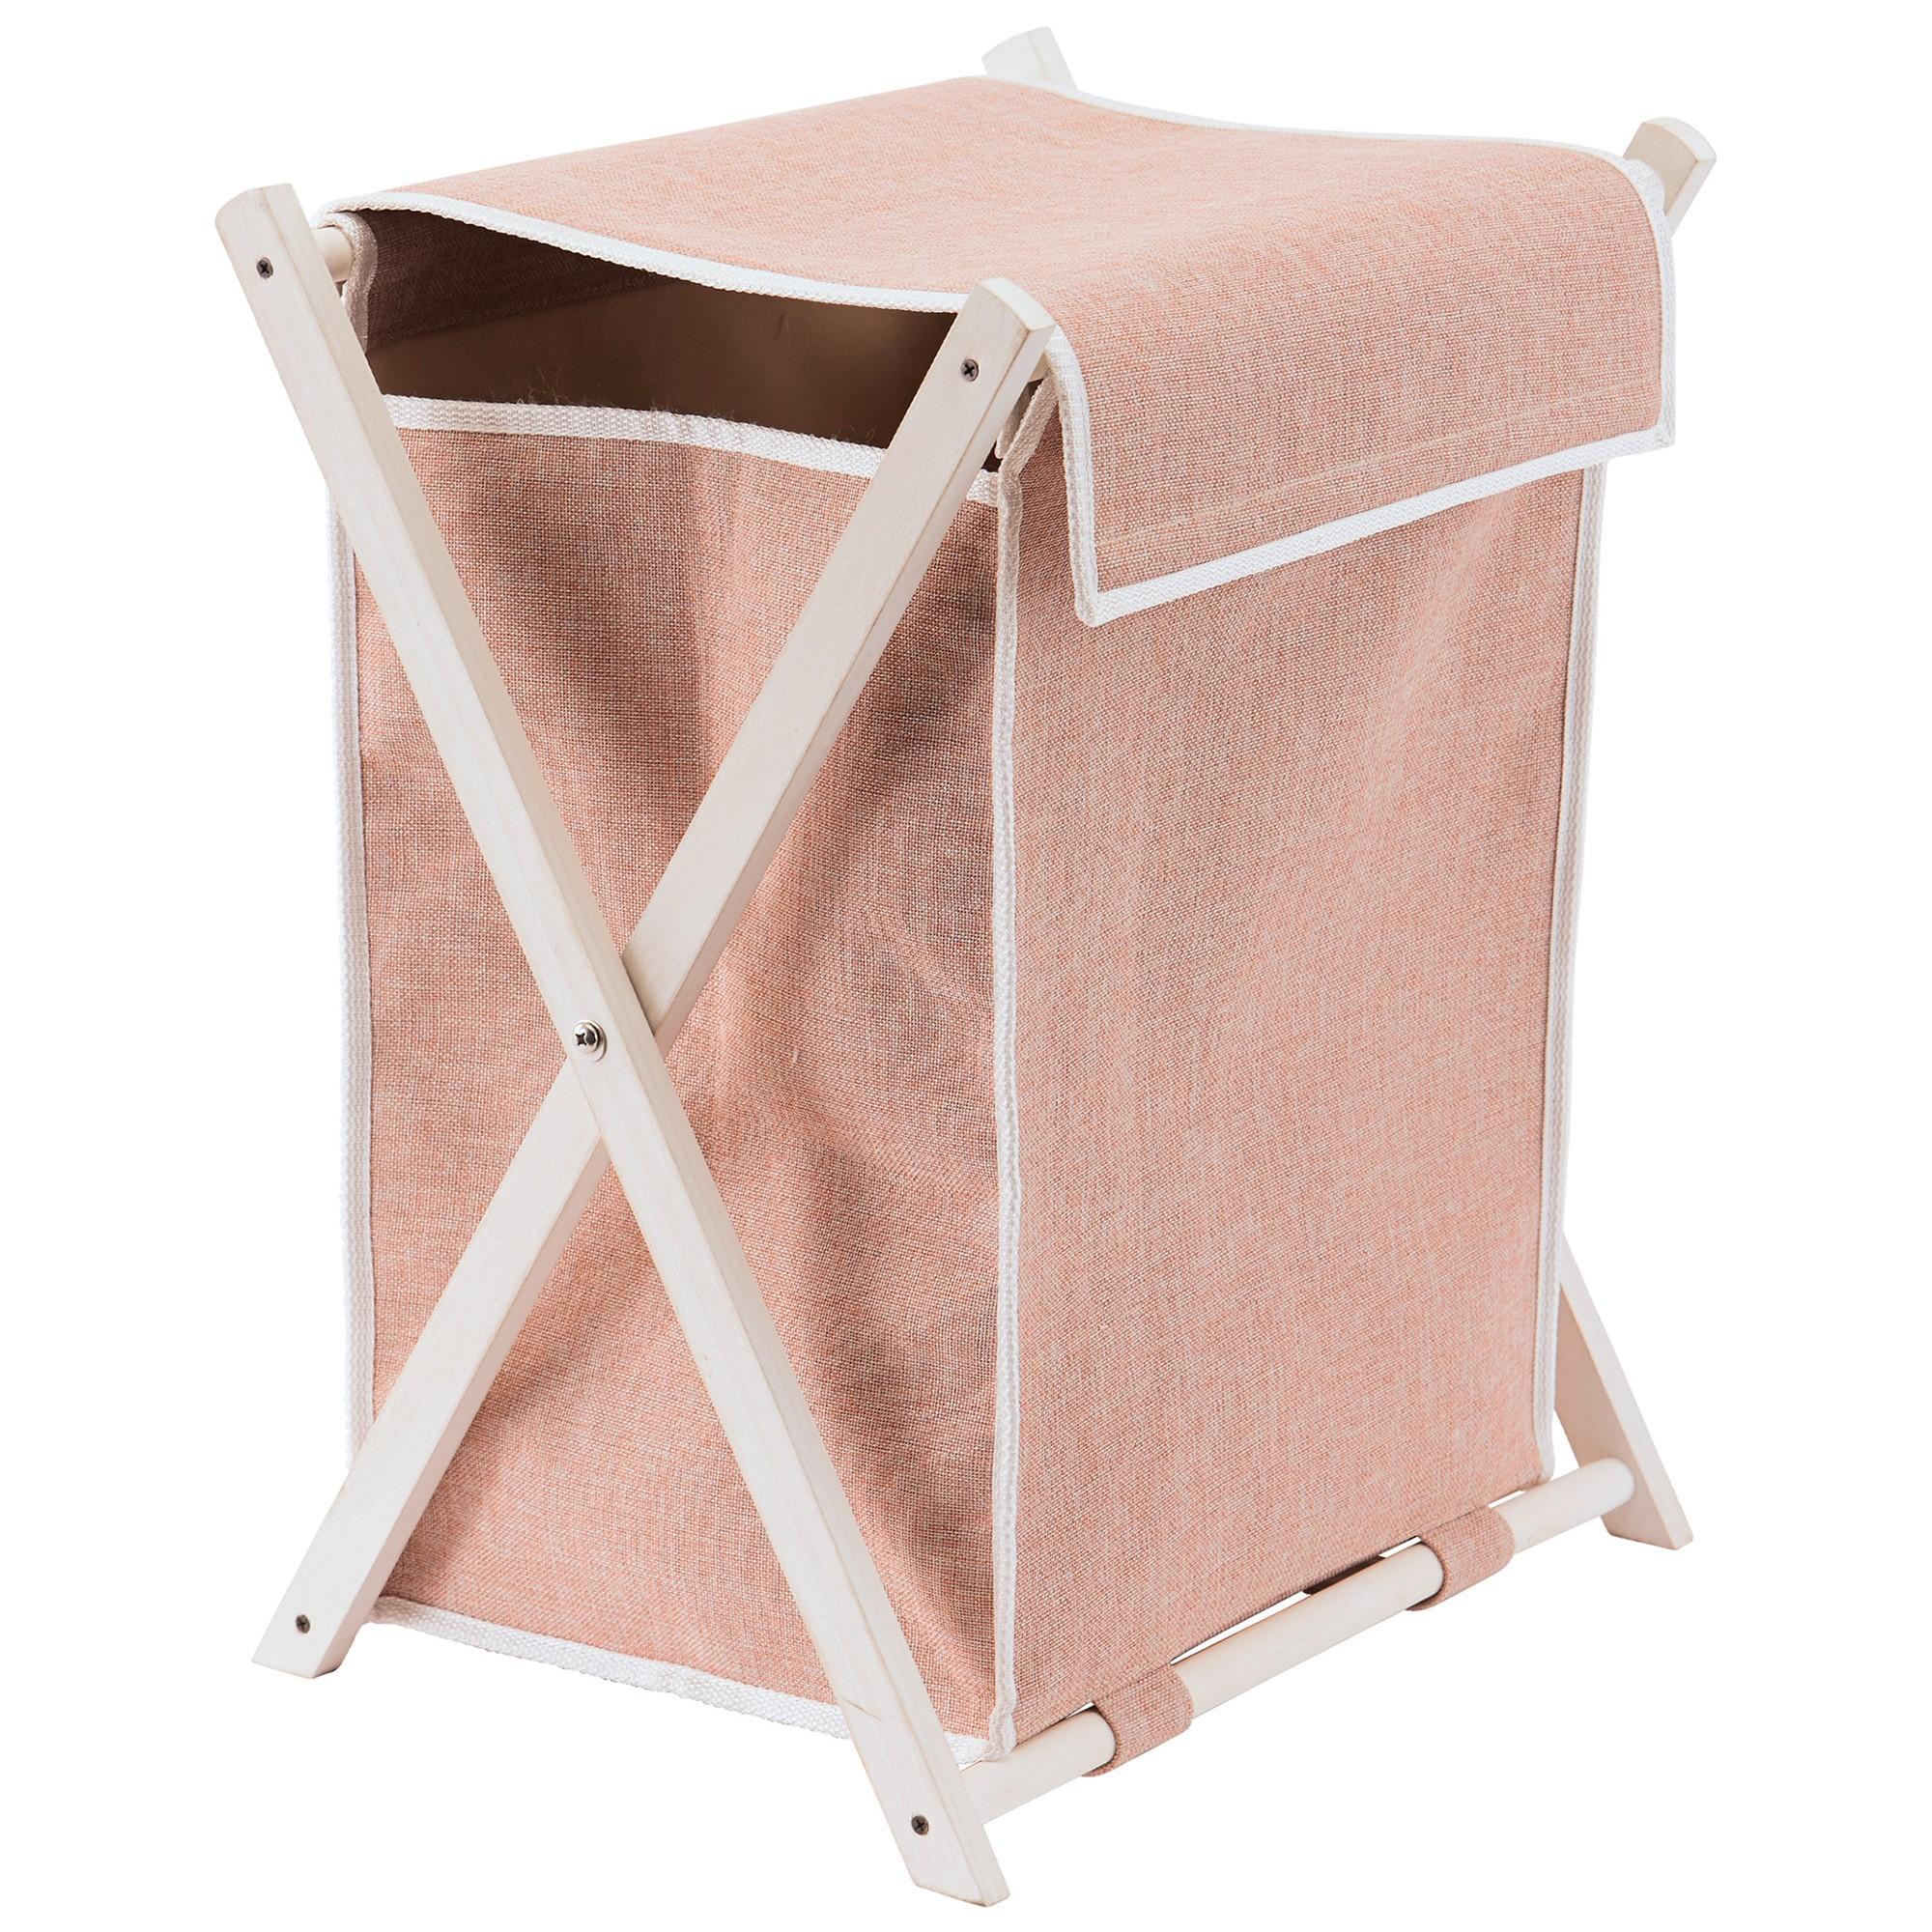 Aquanova Dali Fabric Laundry Basket, Blush